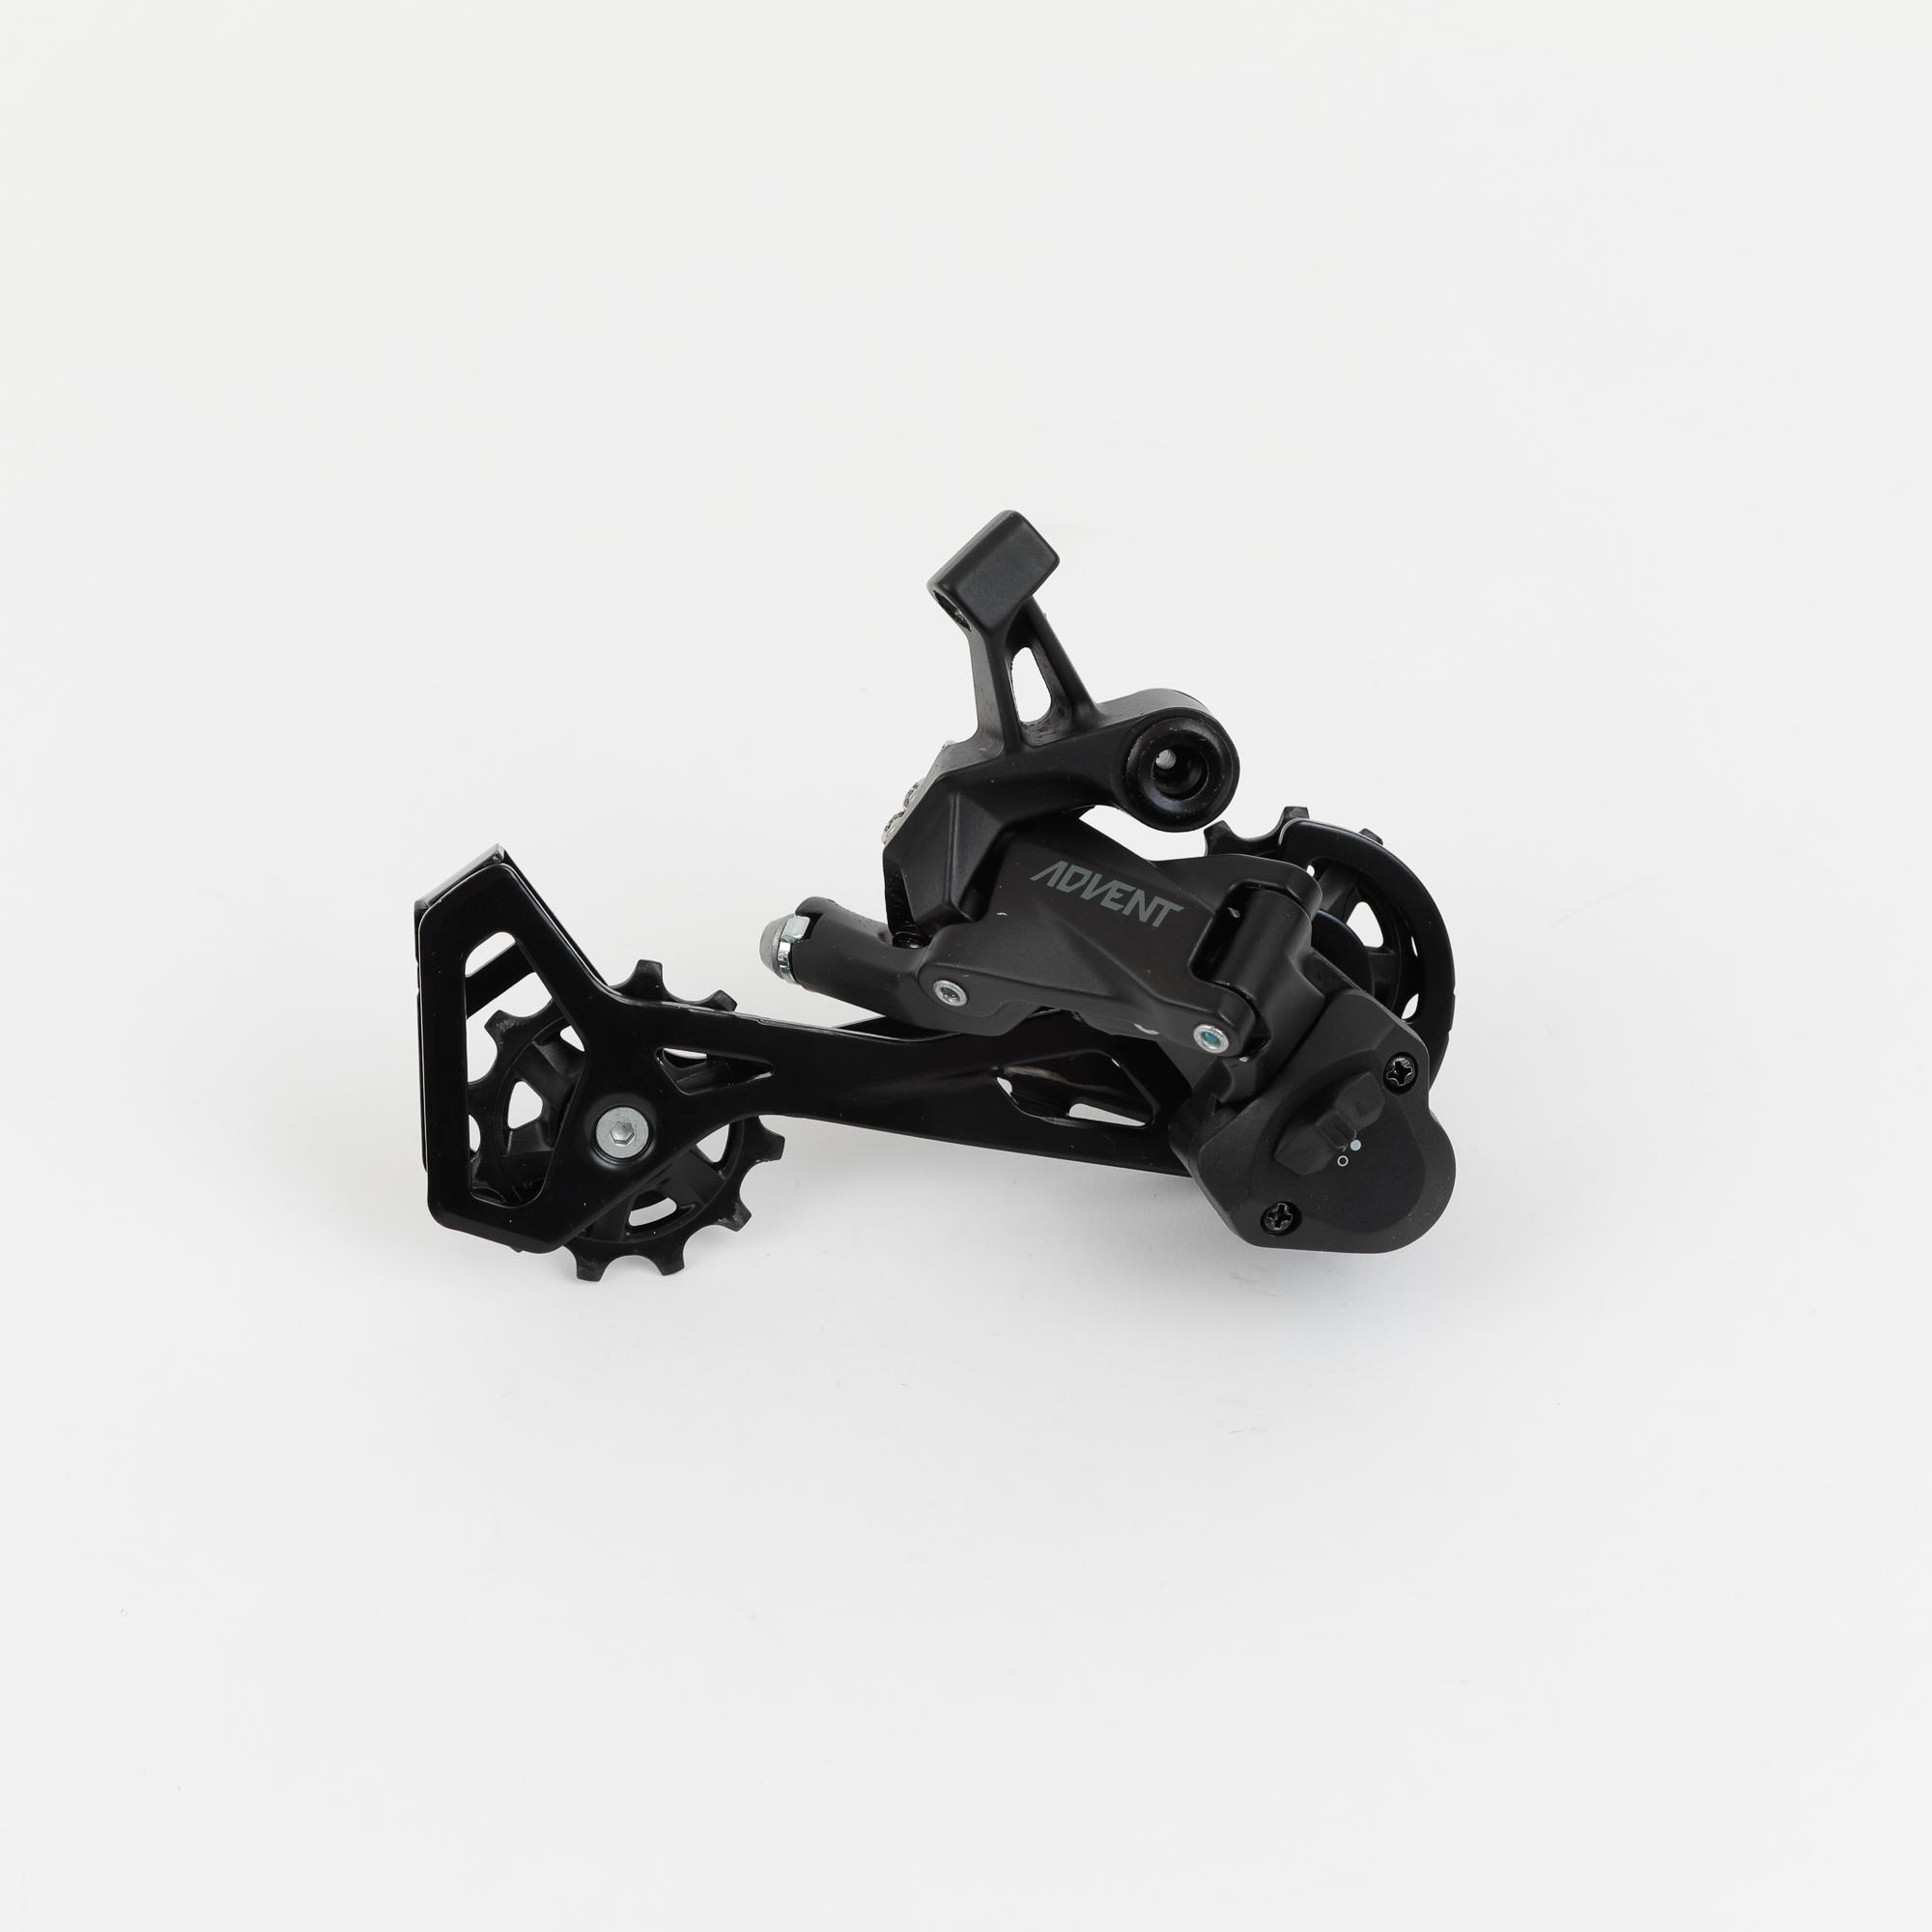 microSHIFT ADVENT Rear Derailleur 9 Speed Medium Cage Black